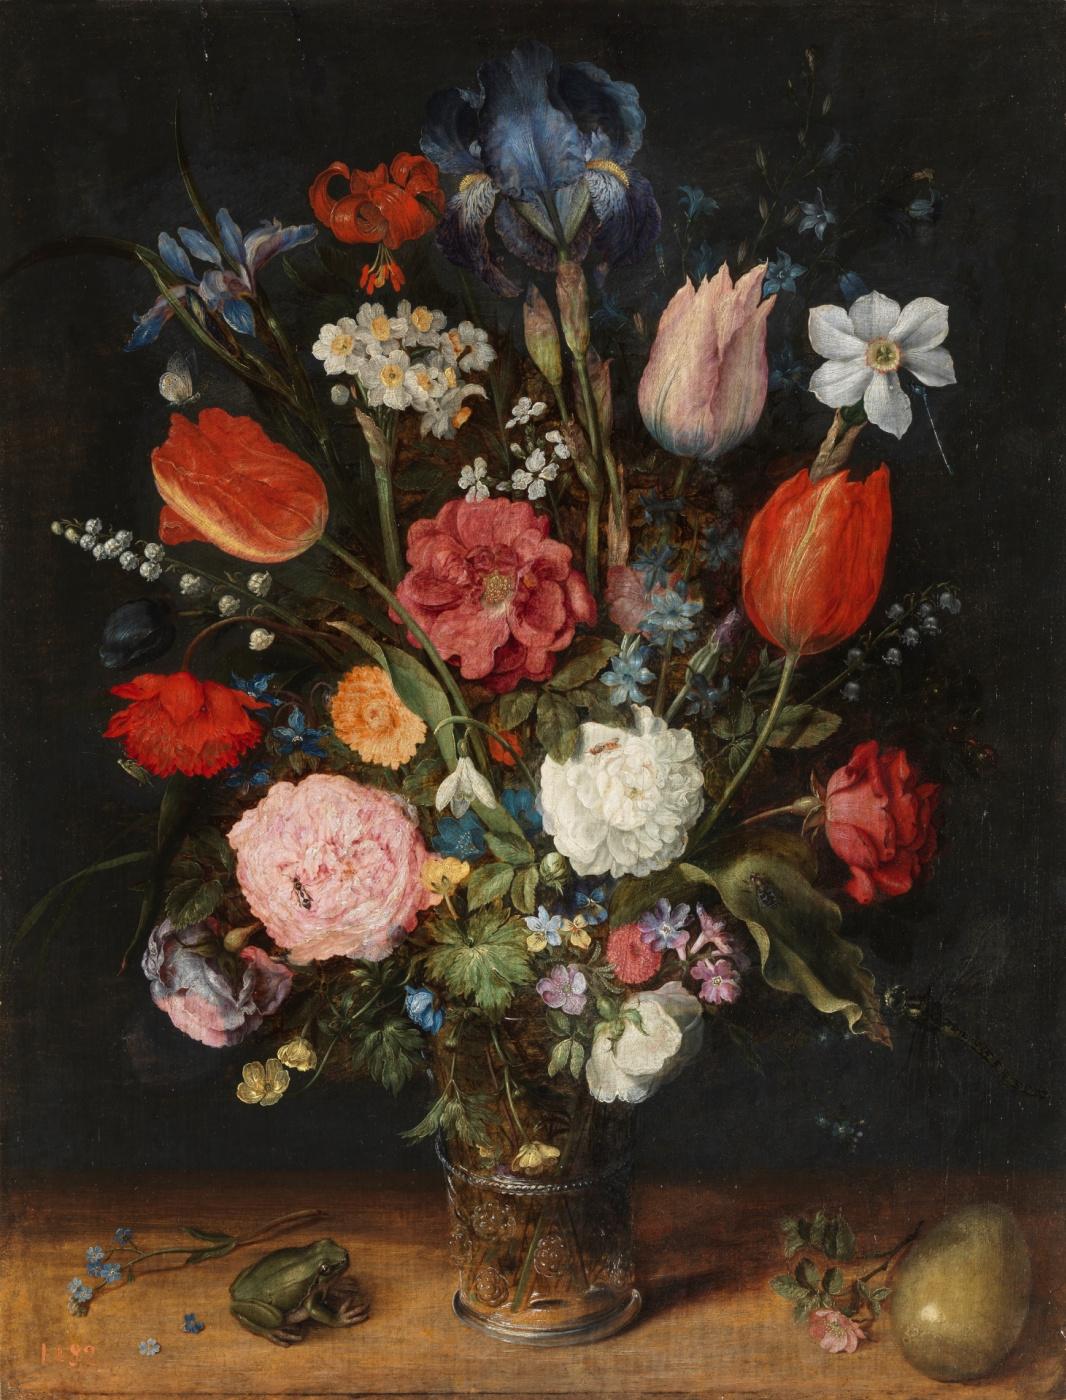 Jan Bruegel The Elder. Bouquet of flowers in a vase, frog and egg